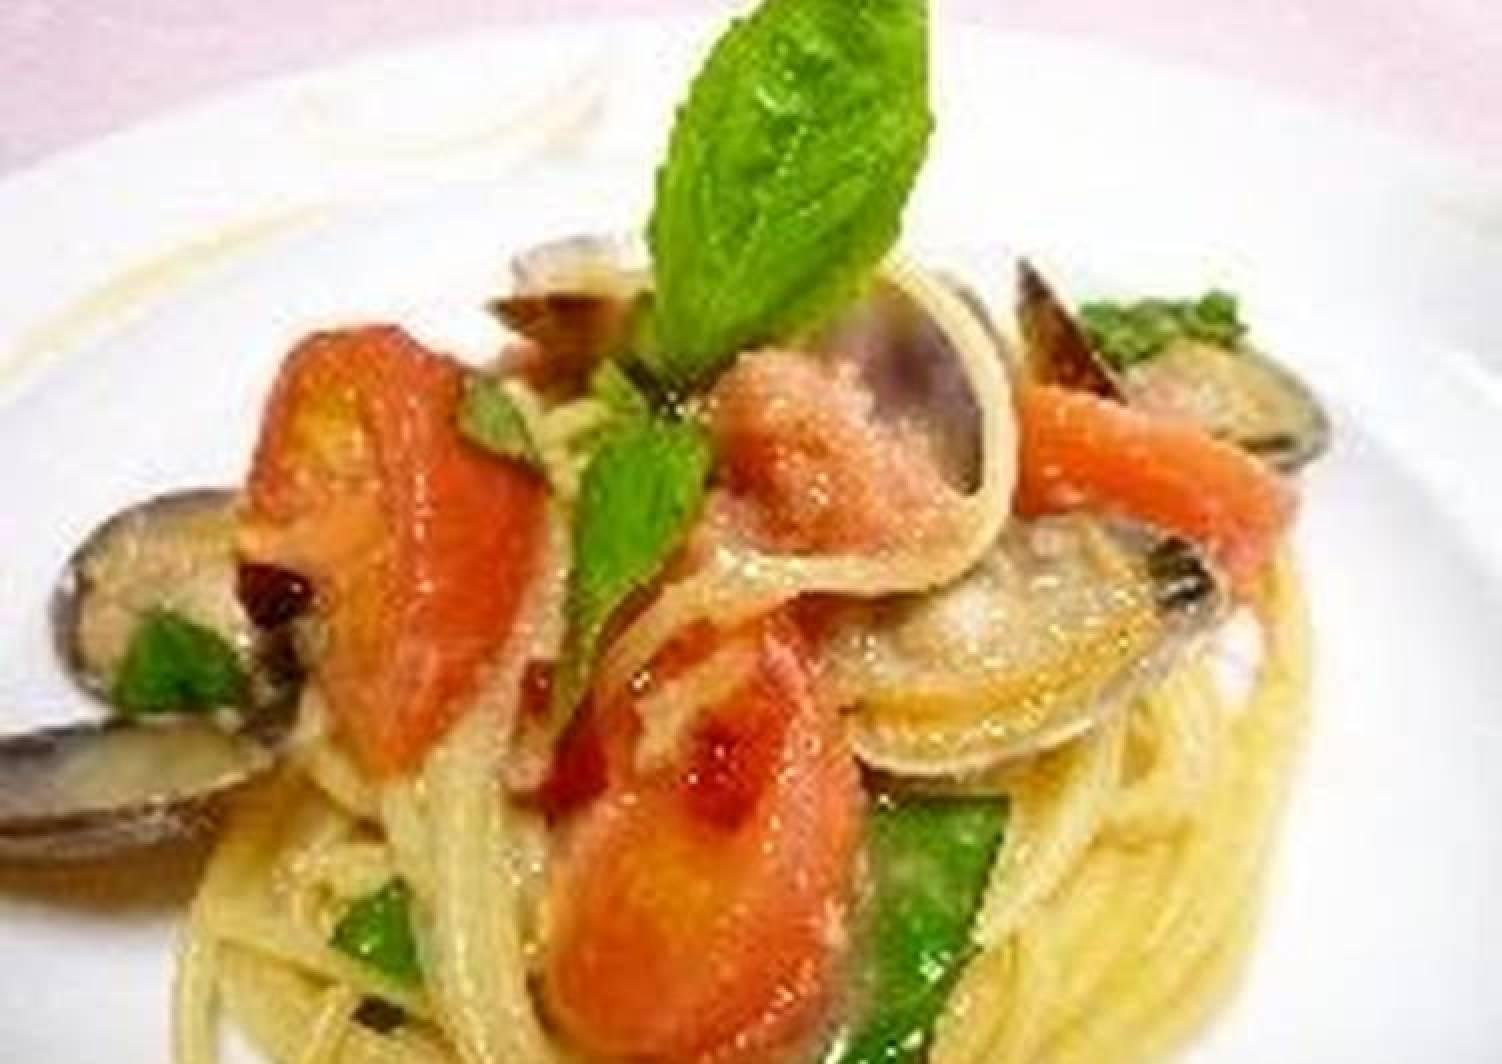 Chilled Pasta alle Vongole with Tarako